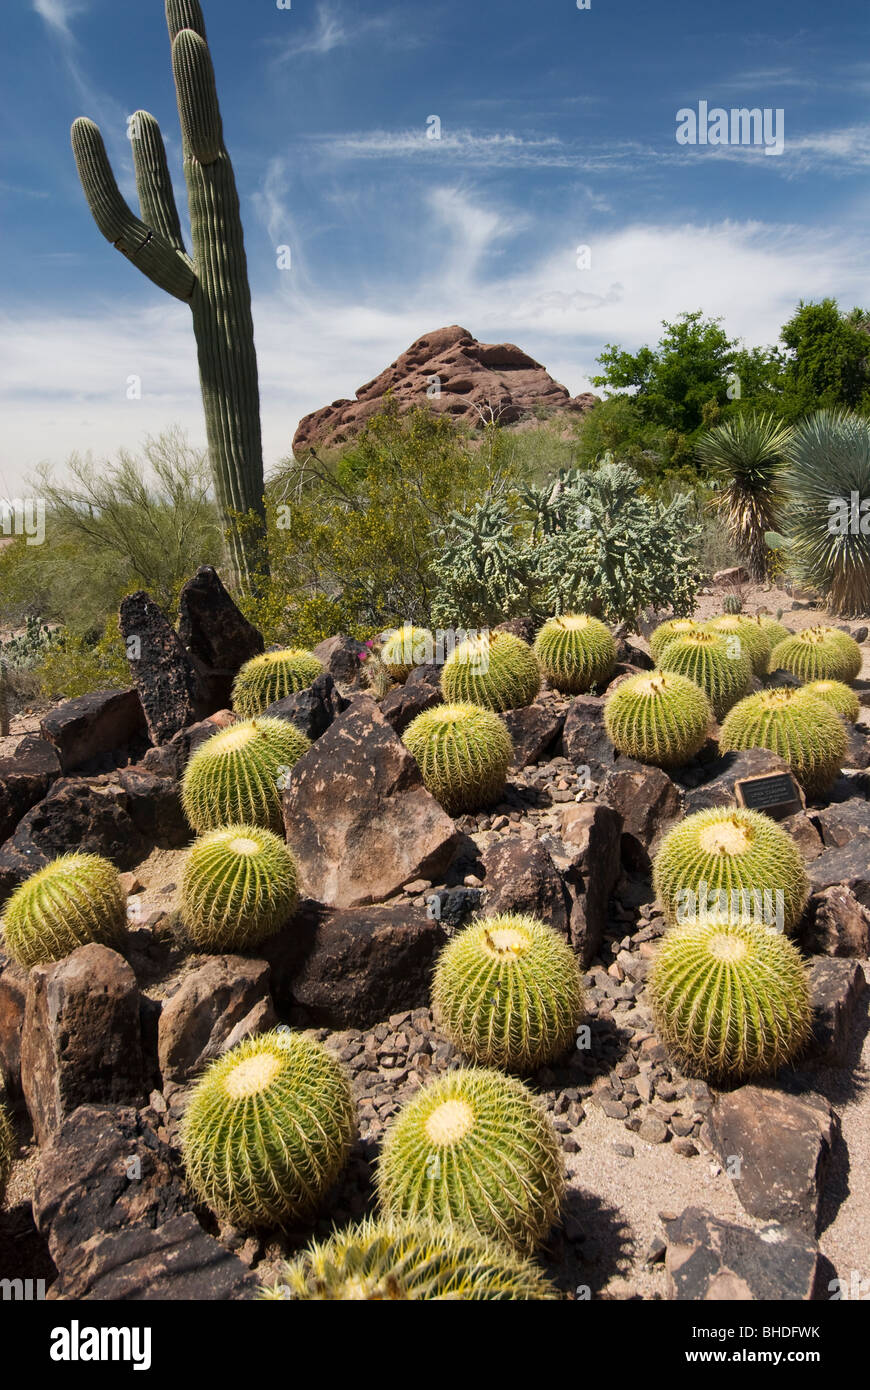 Barrel Cacti at Desert Botanical Garden Phoenix Arizona Stock Photo ...